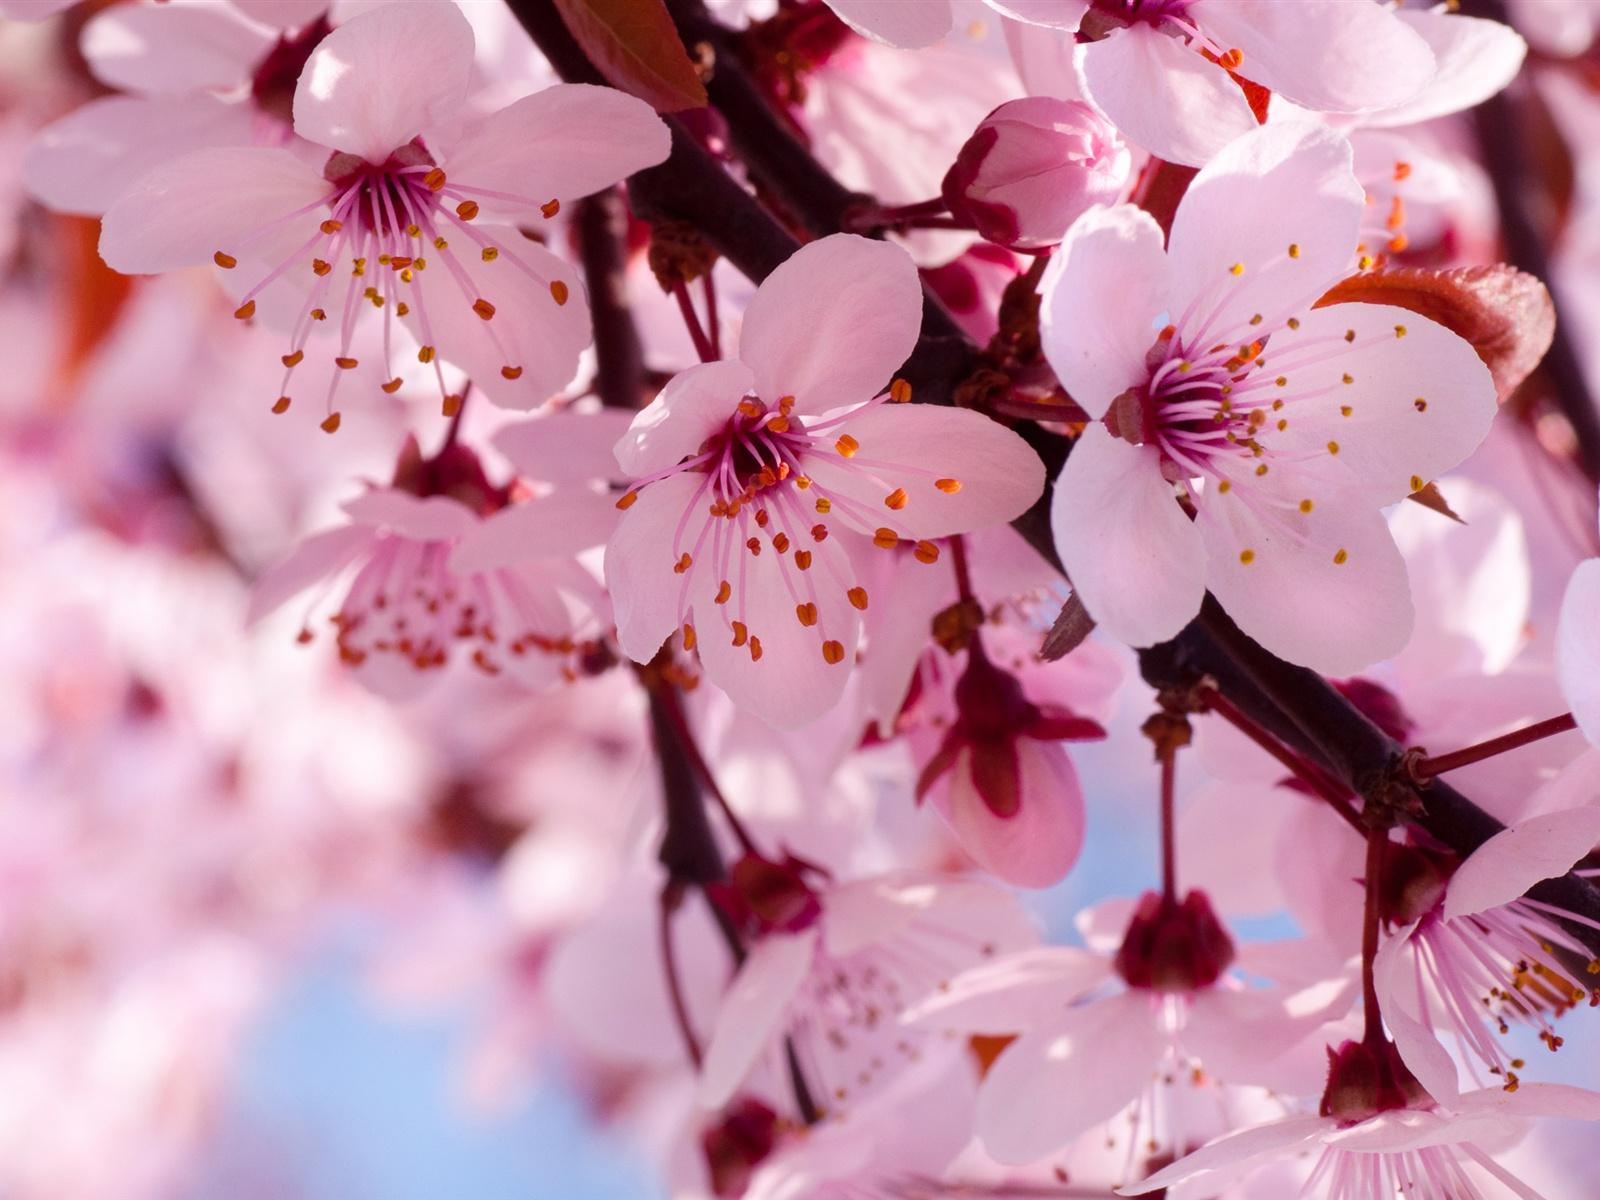 Flowers Pink Cherry Blossom